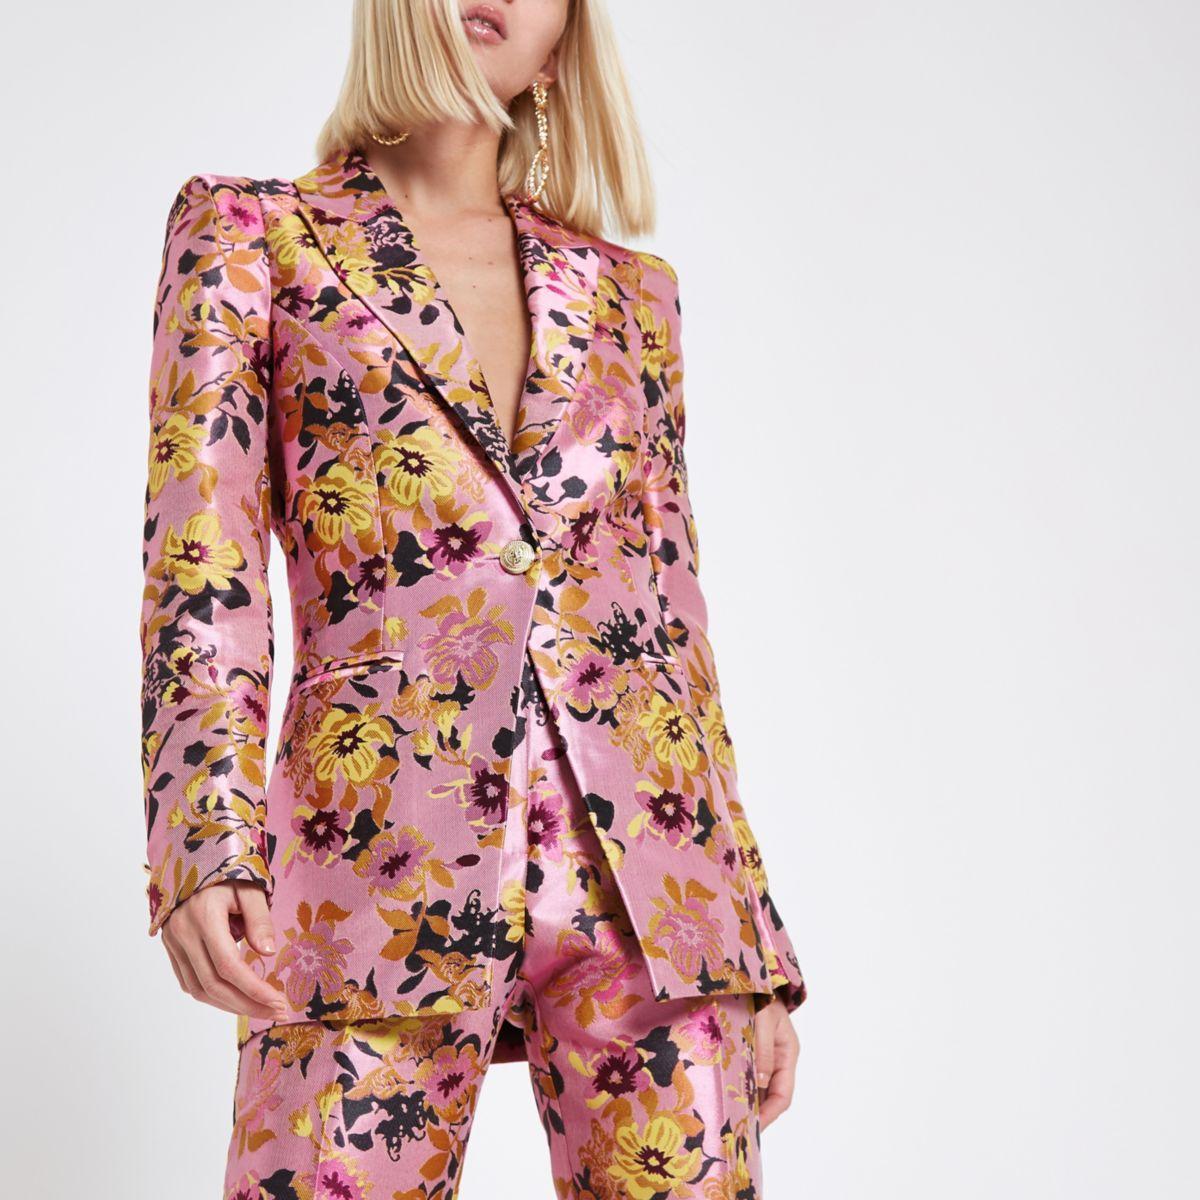 Daftar Harga Violet Floral Blazer Termurah 2018 Womenamp039s Retro 3 4 Sleeve Denim Slim Bubble T Shirt Dress Pink Jacquard Tux Jacket Blazers Coats Jackets Women